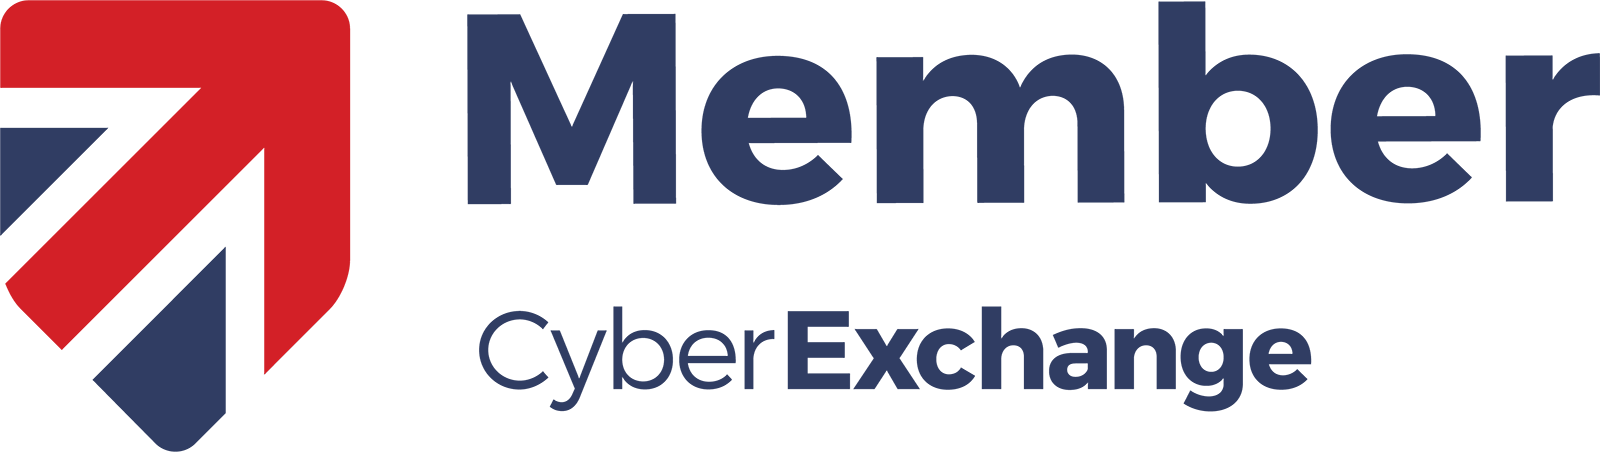 Cyber Exchange_Member Badge_Full (11)